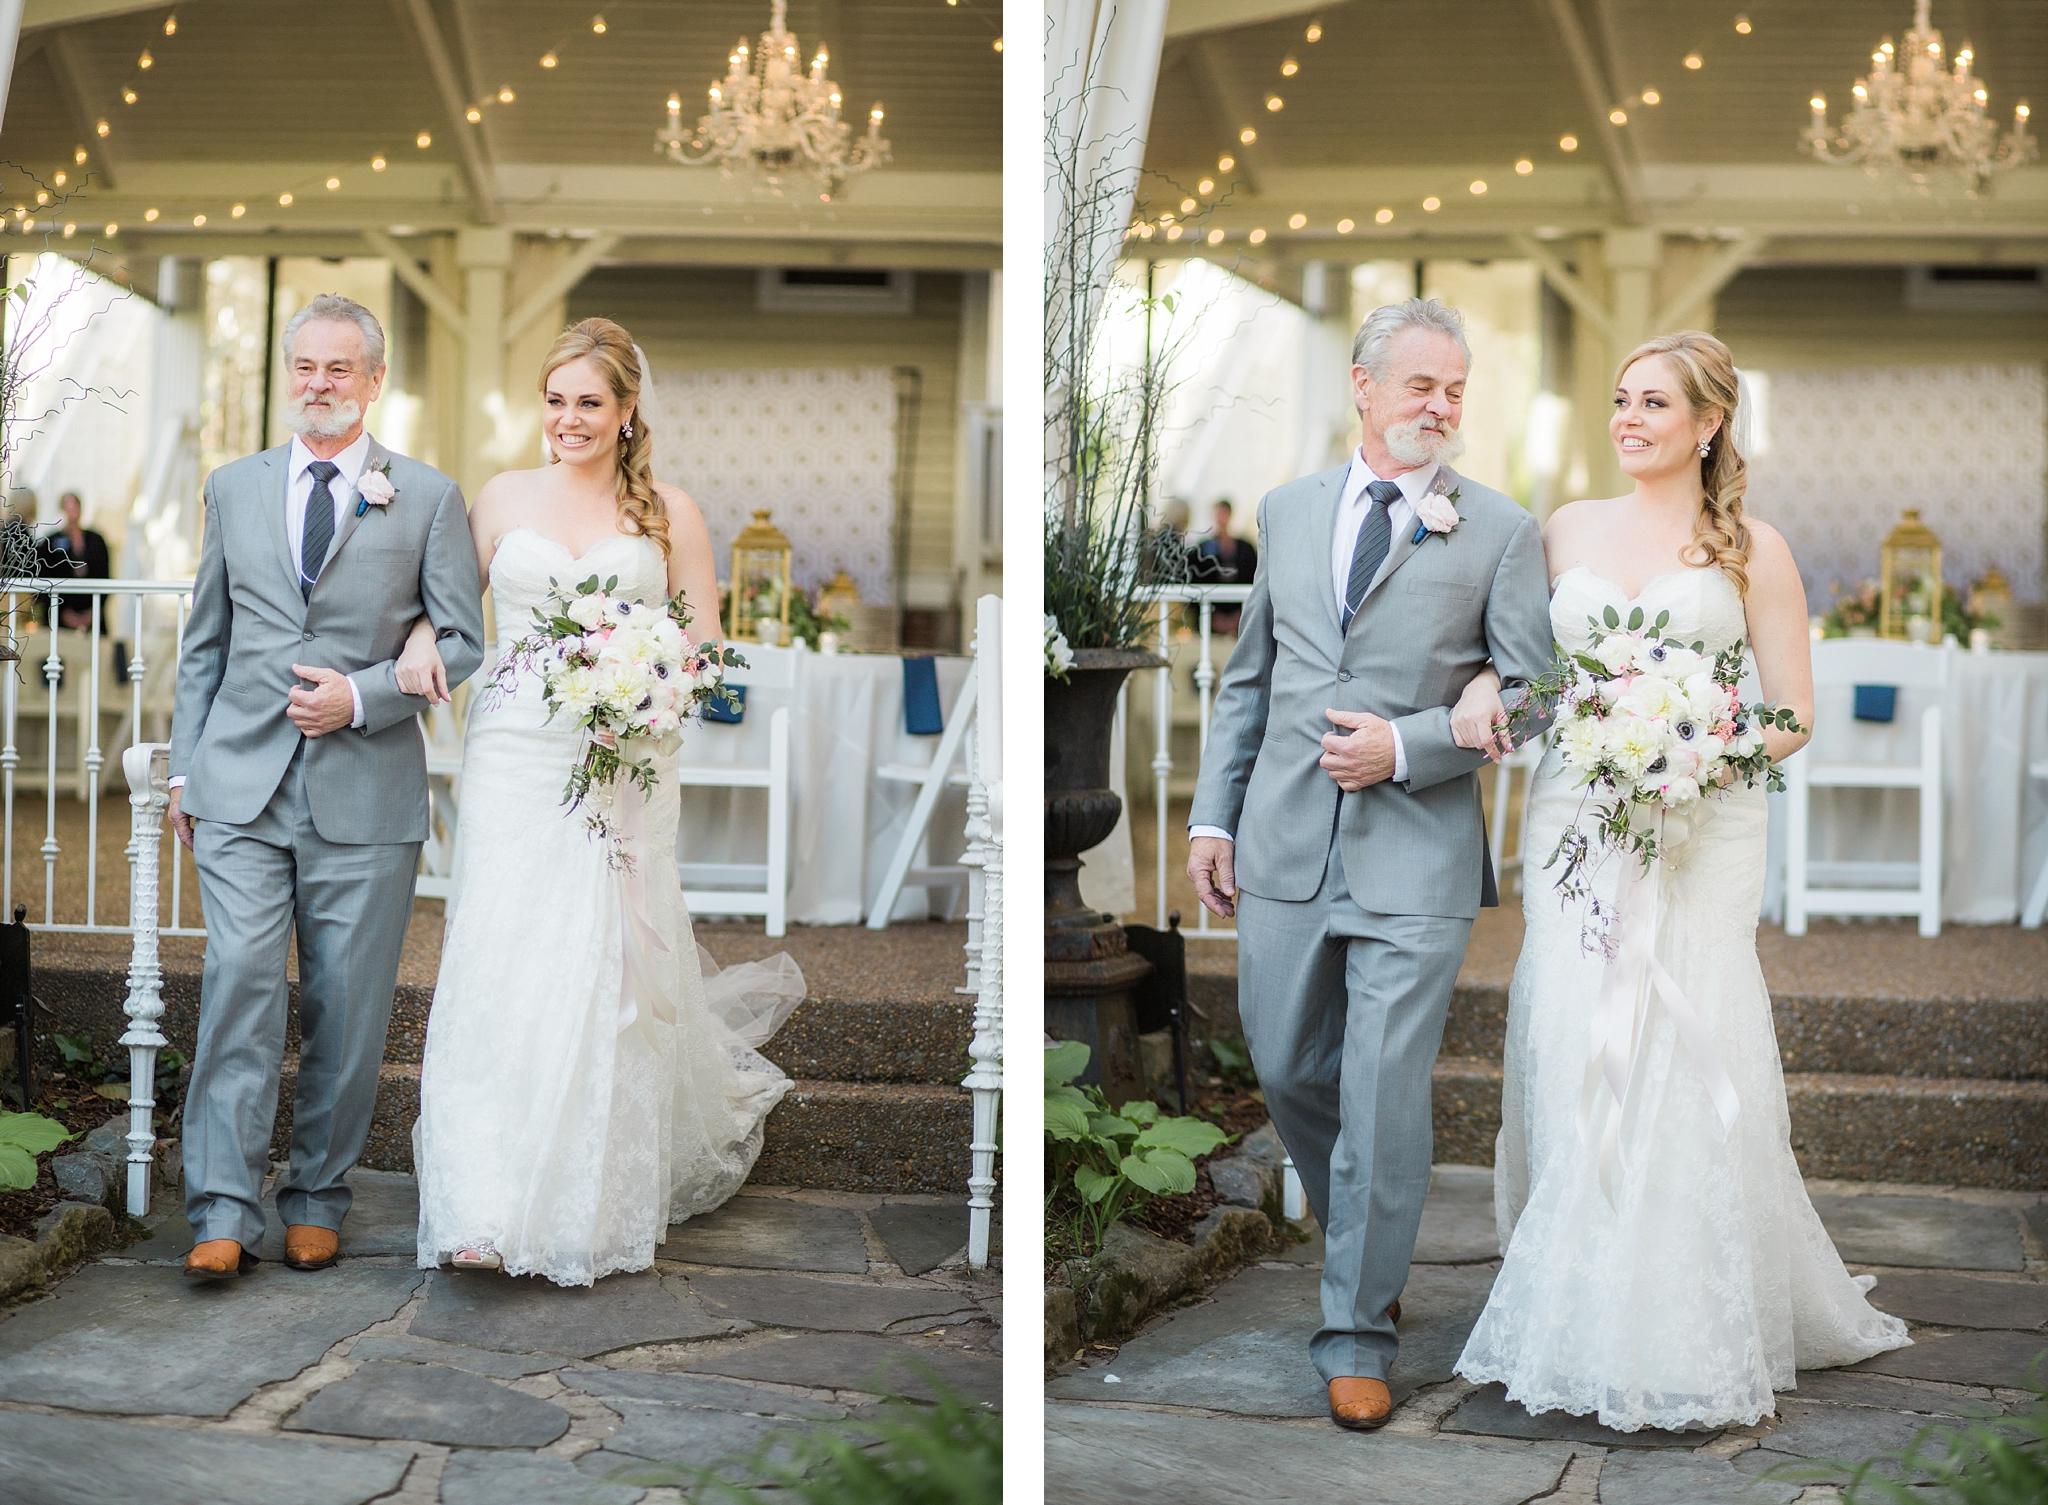 dad-bride-down-aisle.jpg